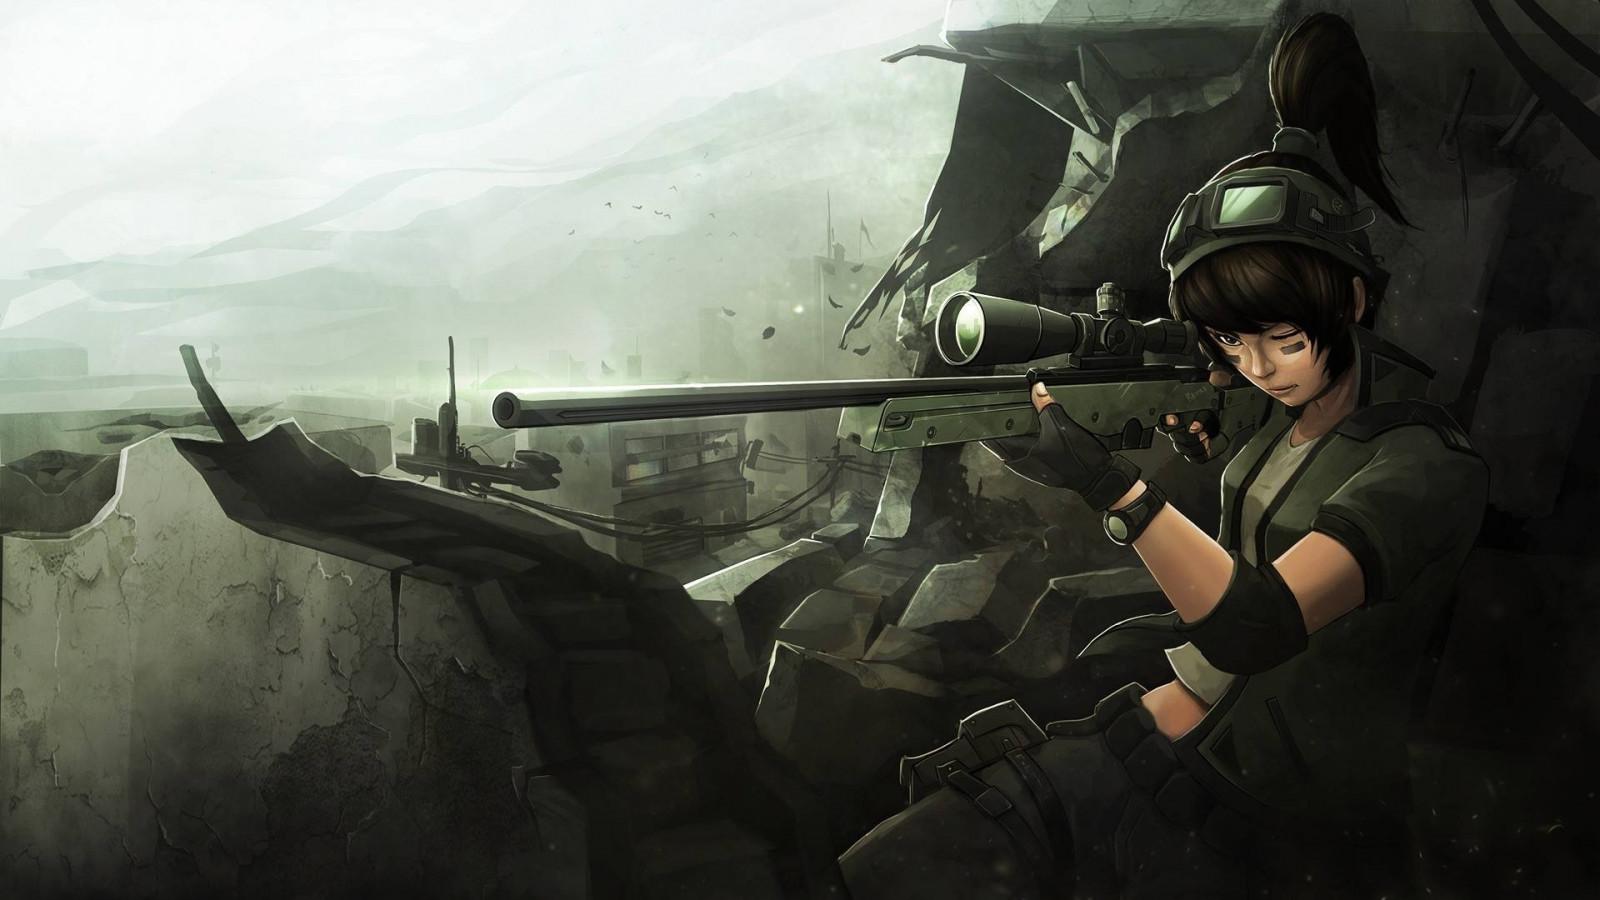 anime war wallpaper - photo #48